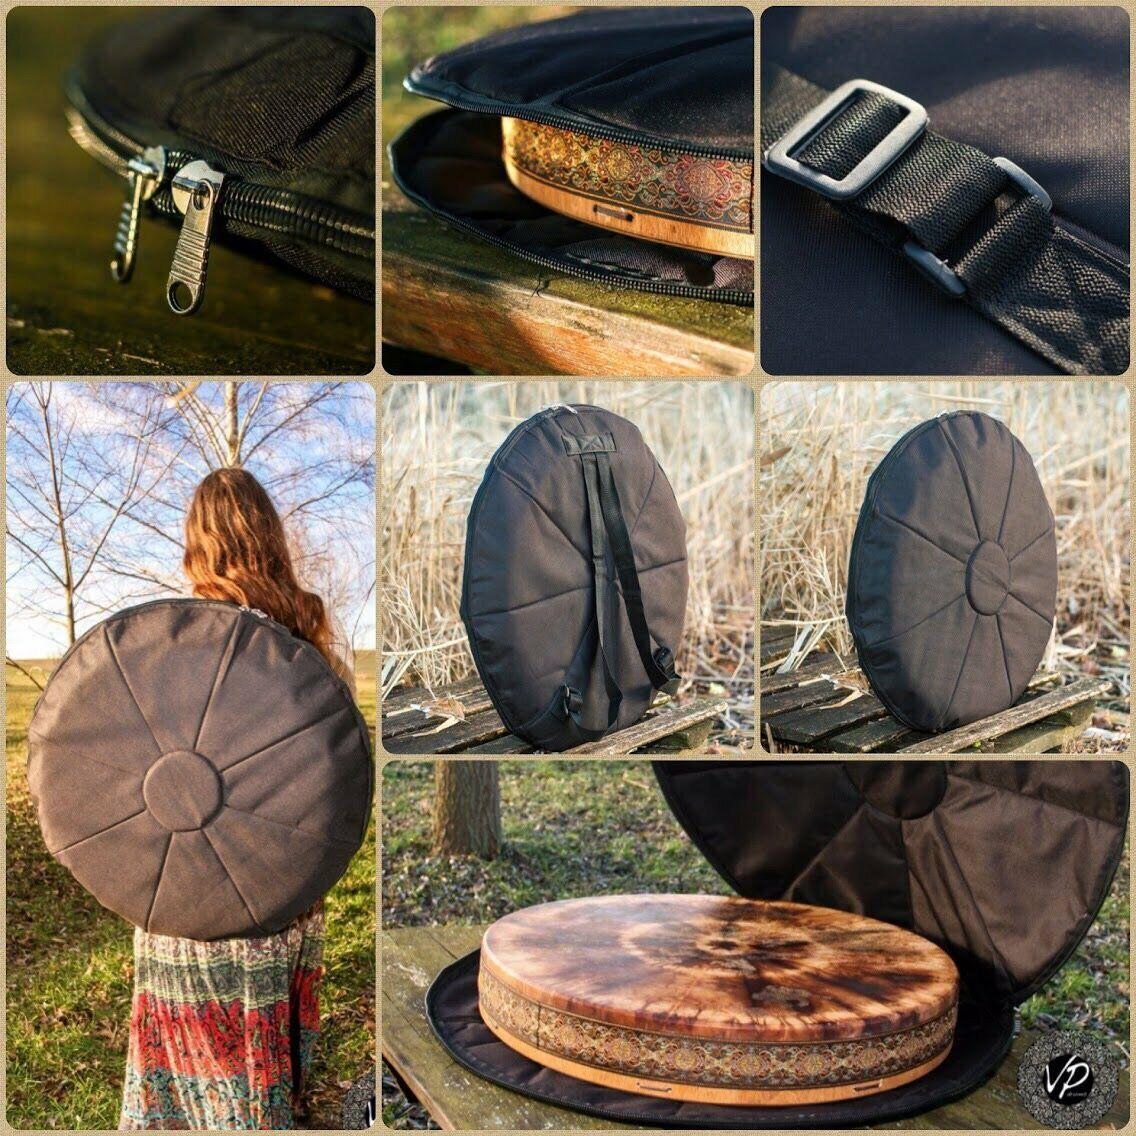 20-22' Water-resistant drum case, protection bag, water-resistant backpack